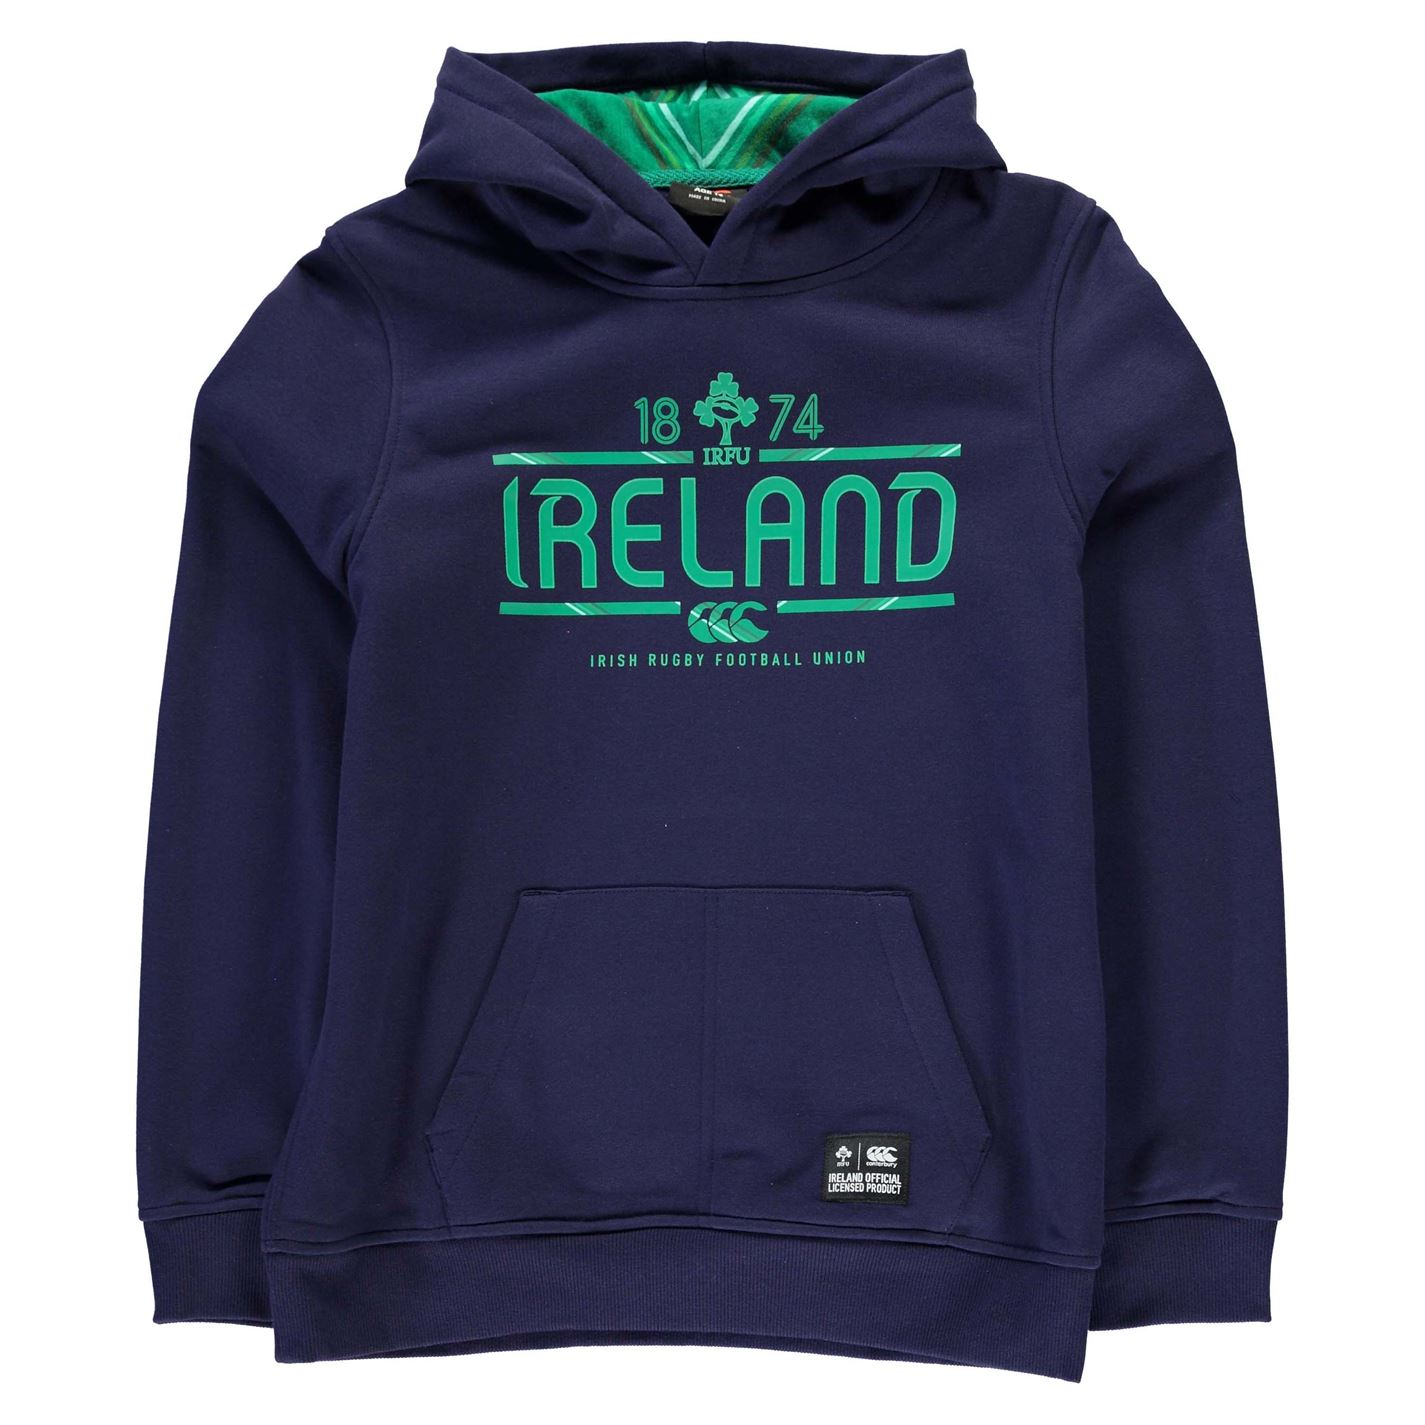 Mikina Cant Ireland Rugby Football Union OTH Hoody Junior Boys ... ed23489c847